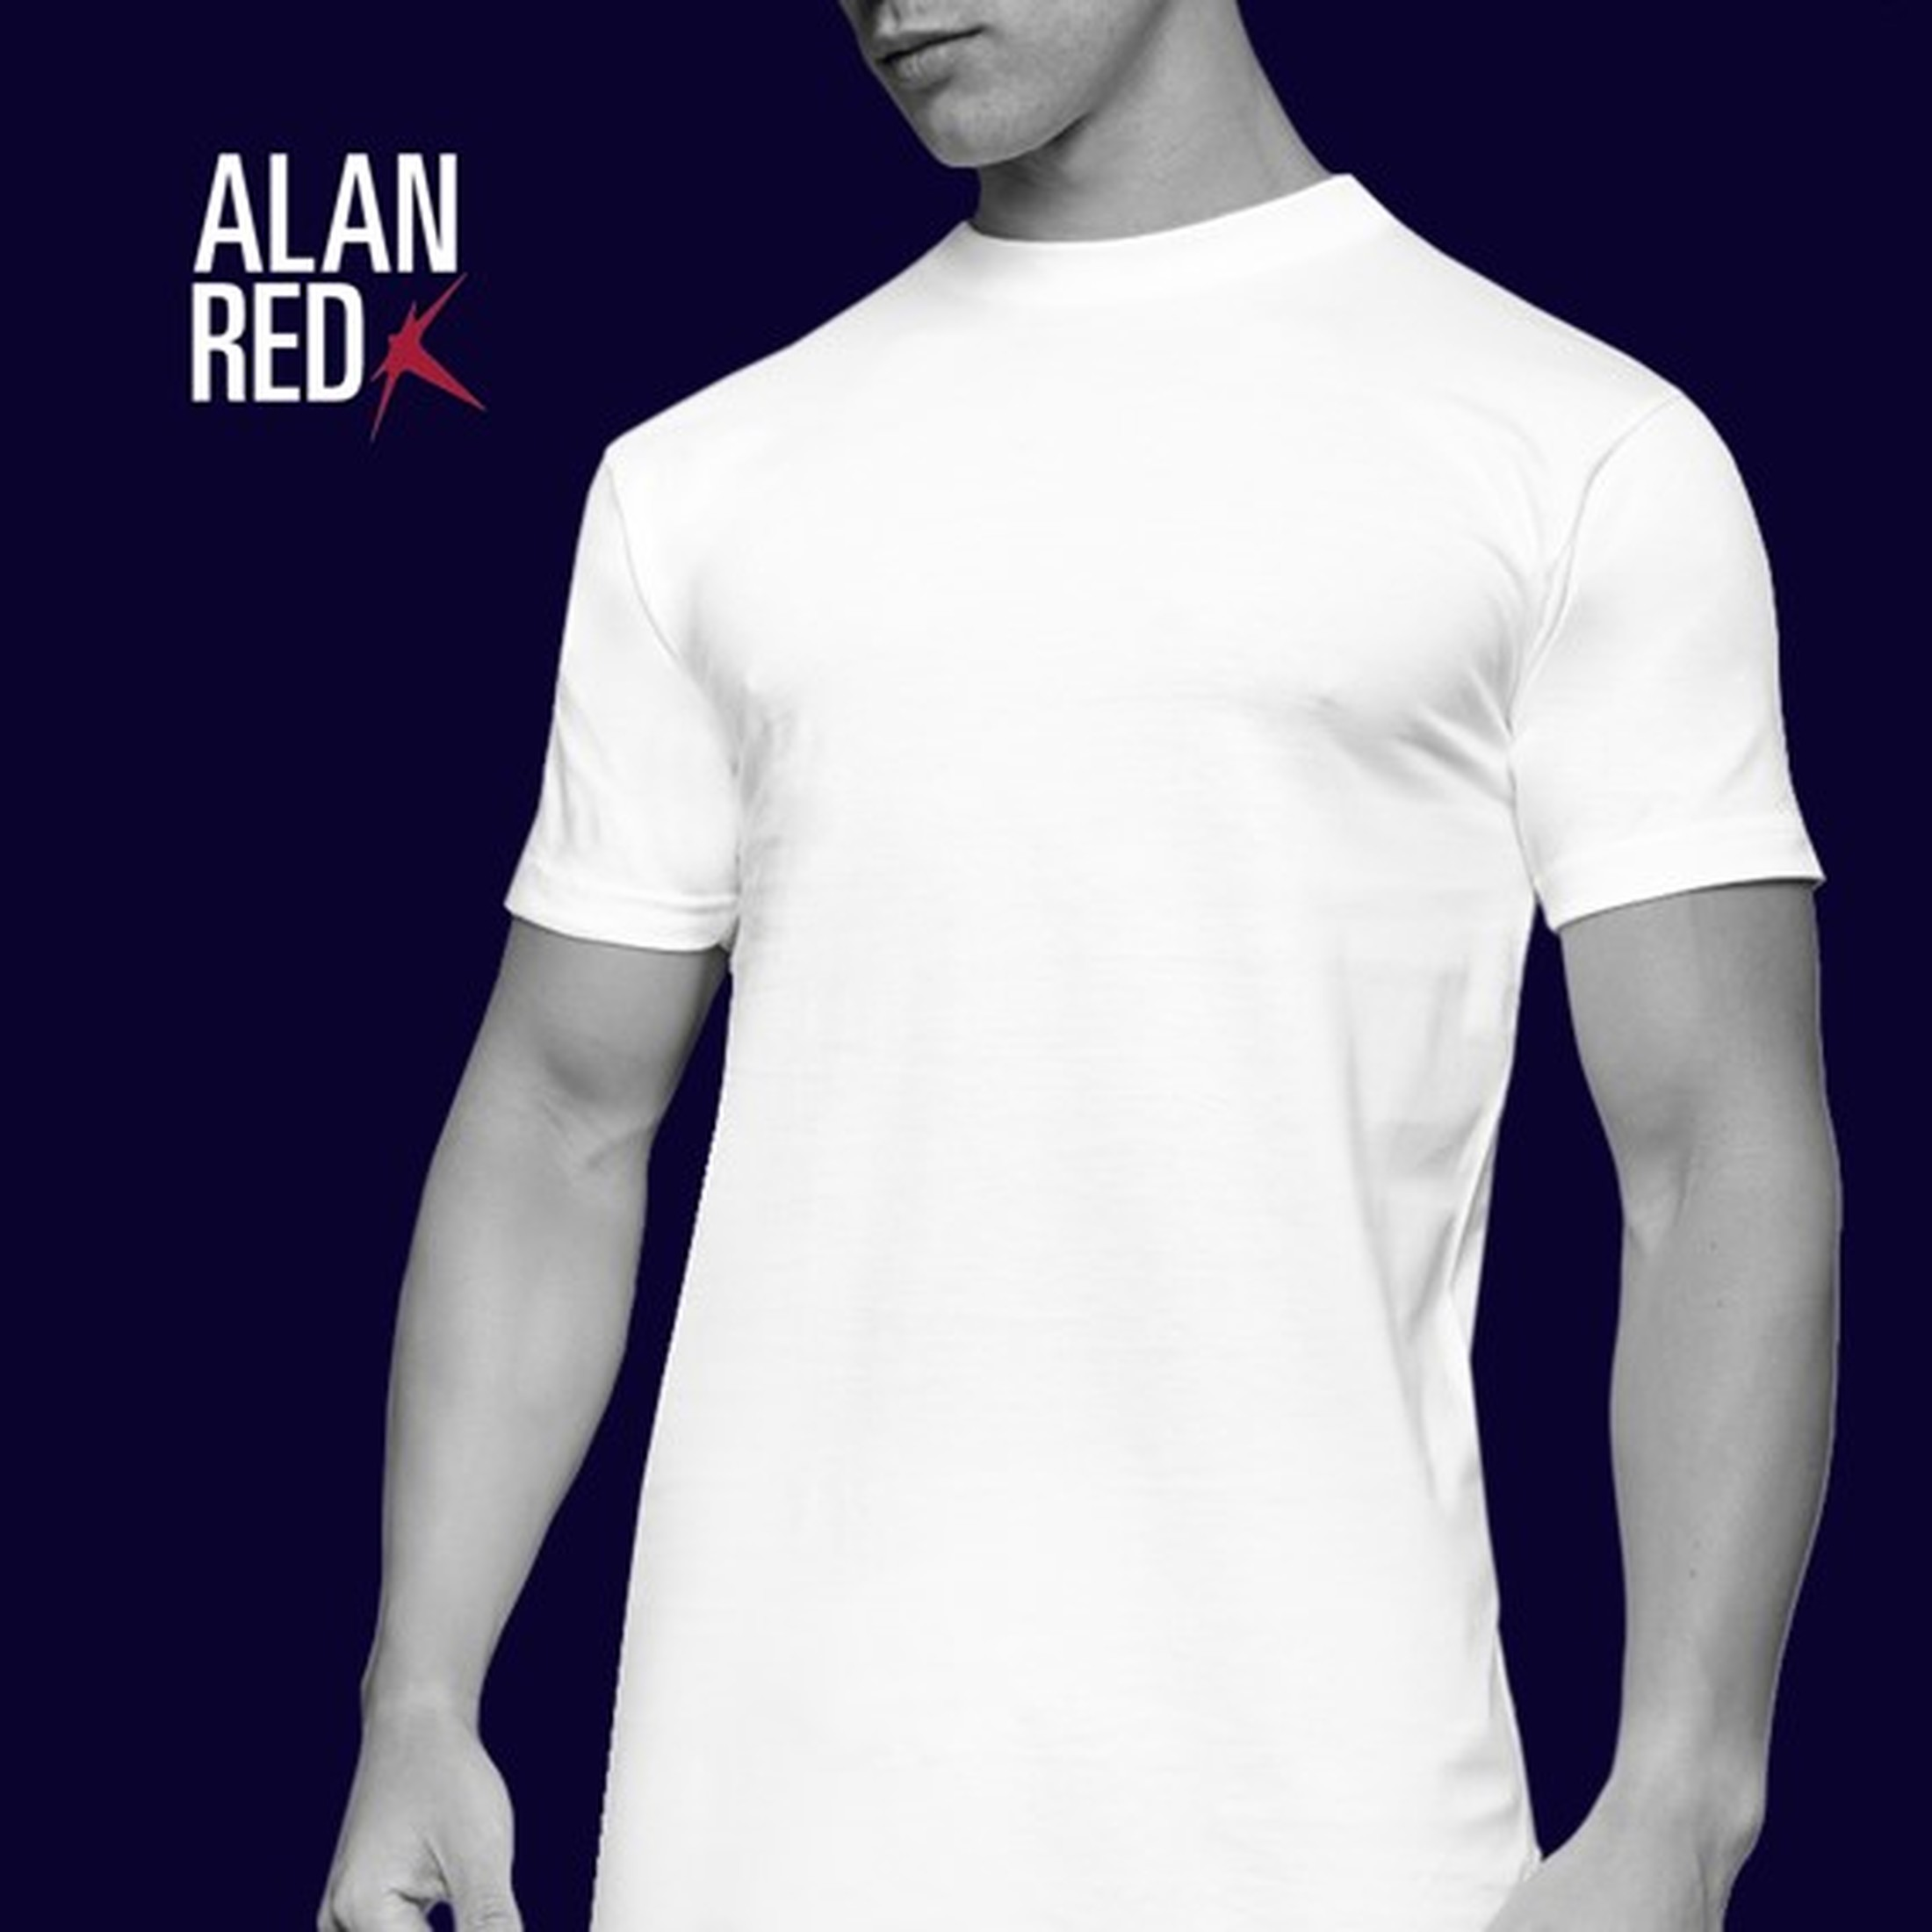 Alan Red T-Shirt Virginia Extra Long (2pack) foto 3